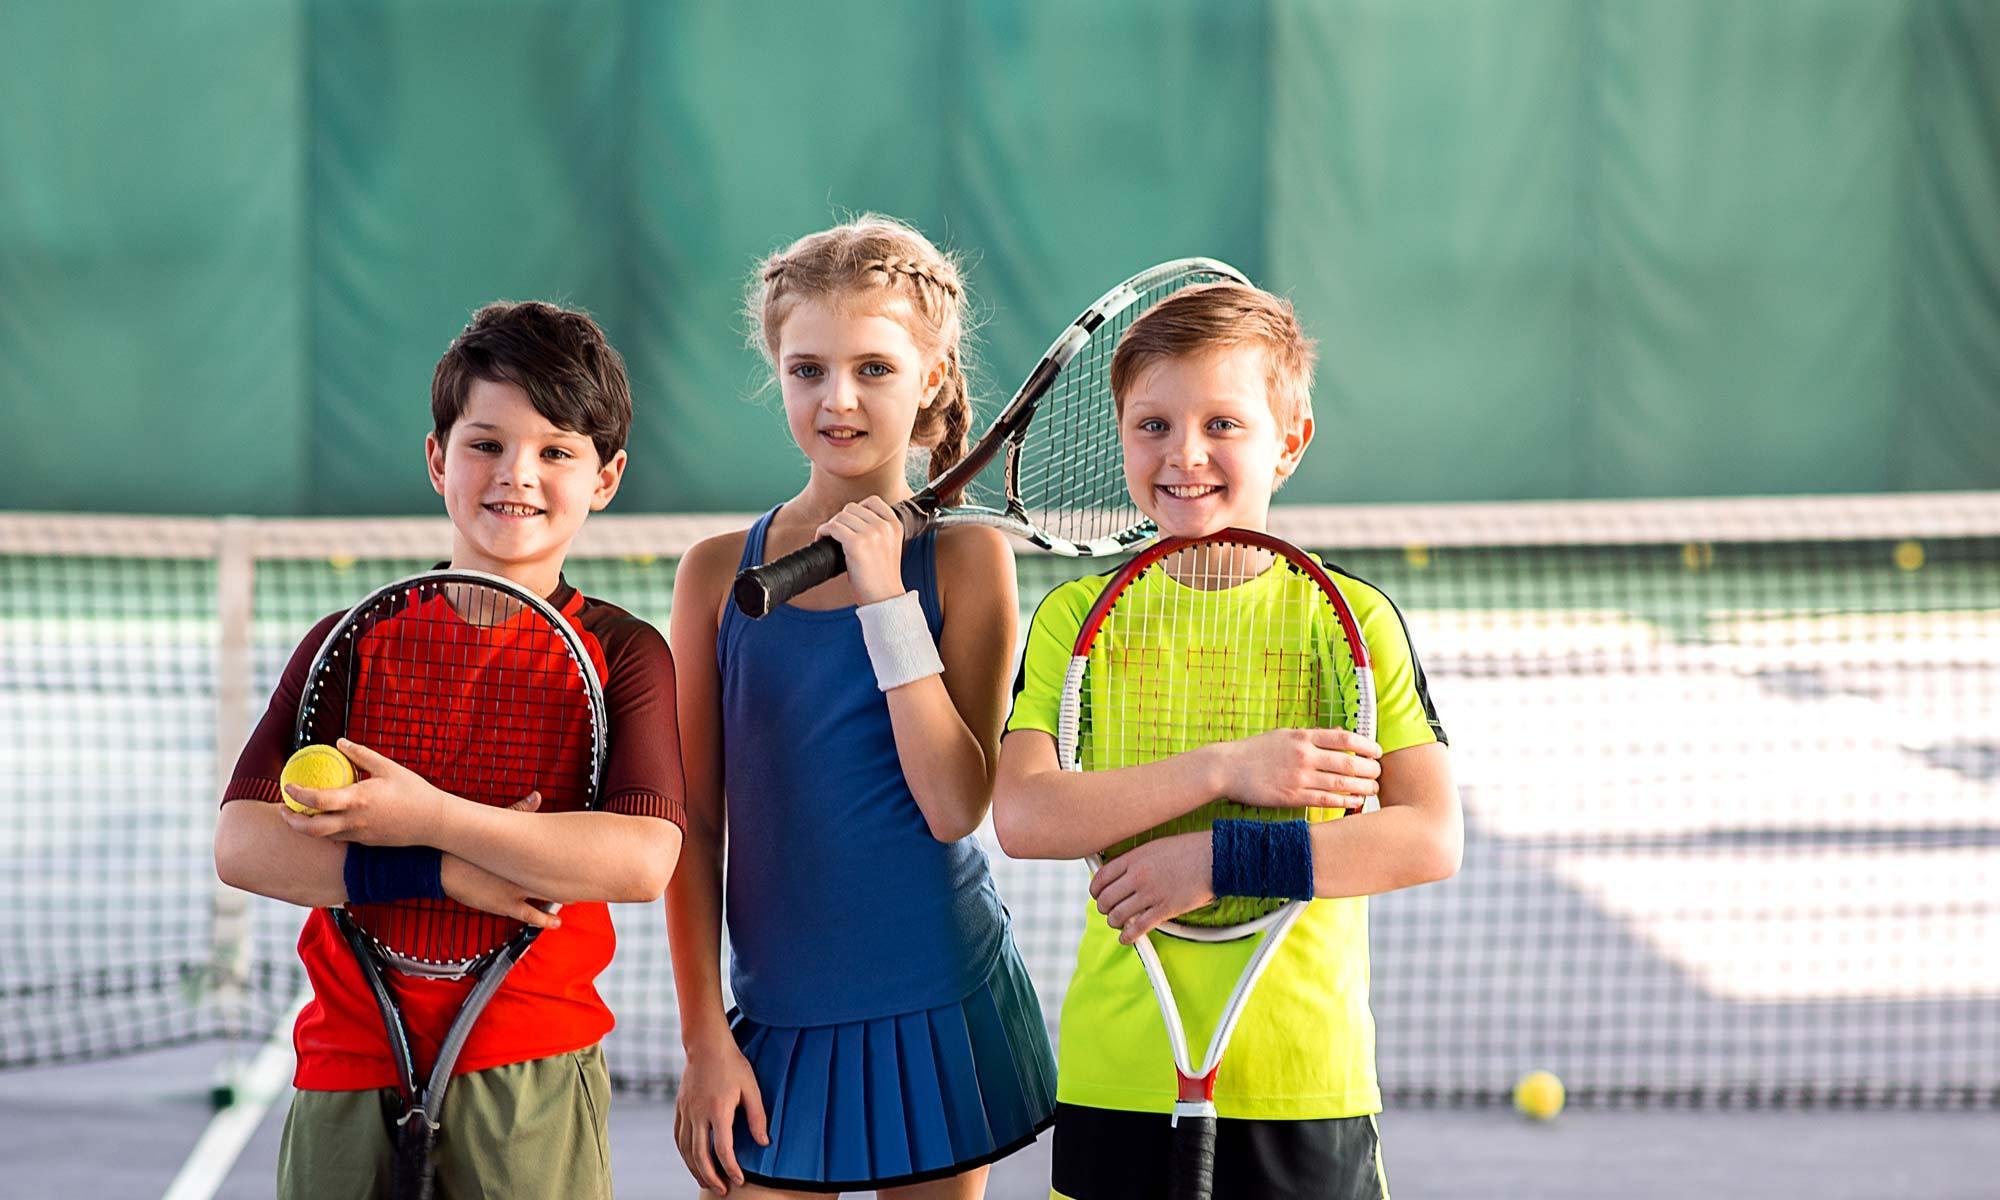 mizner-country-club-tennis-programs-para-5